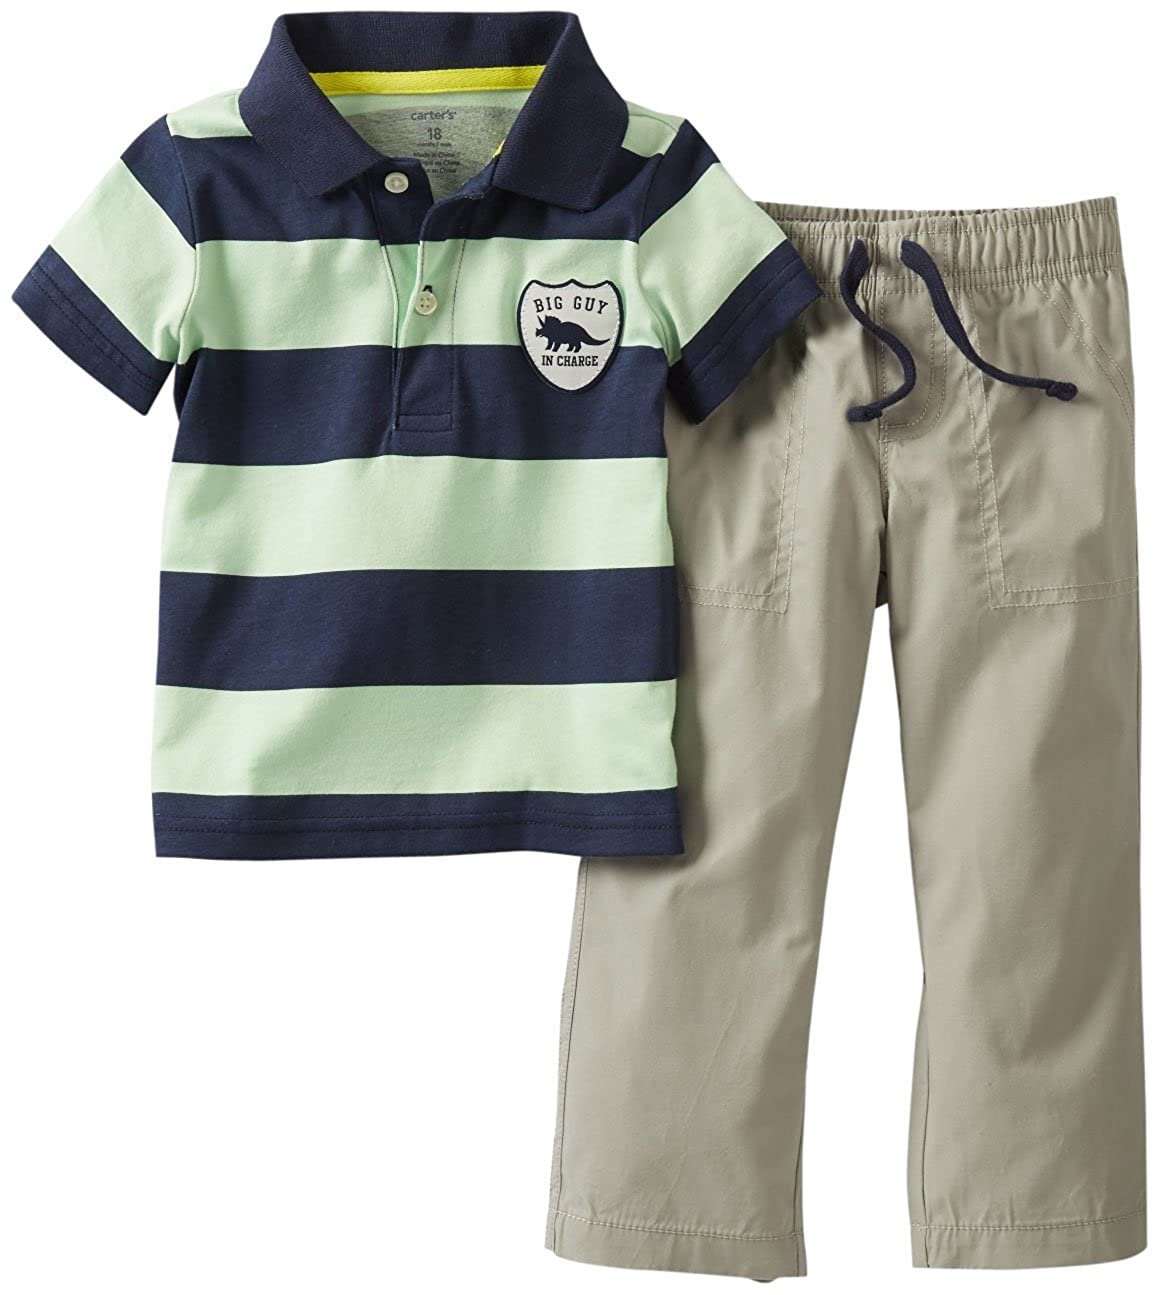 Carters 2-piece LITTLE PILOT IN TRAINING Polo Shirt /& Pants Set